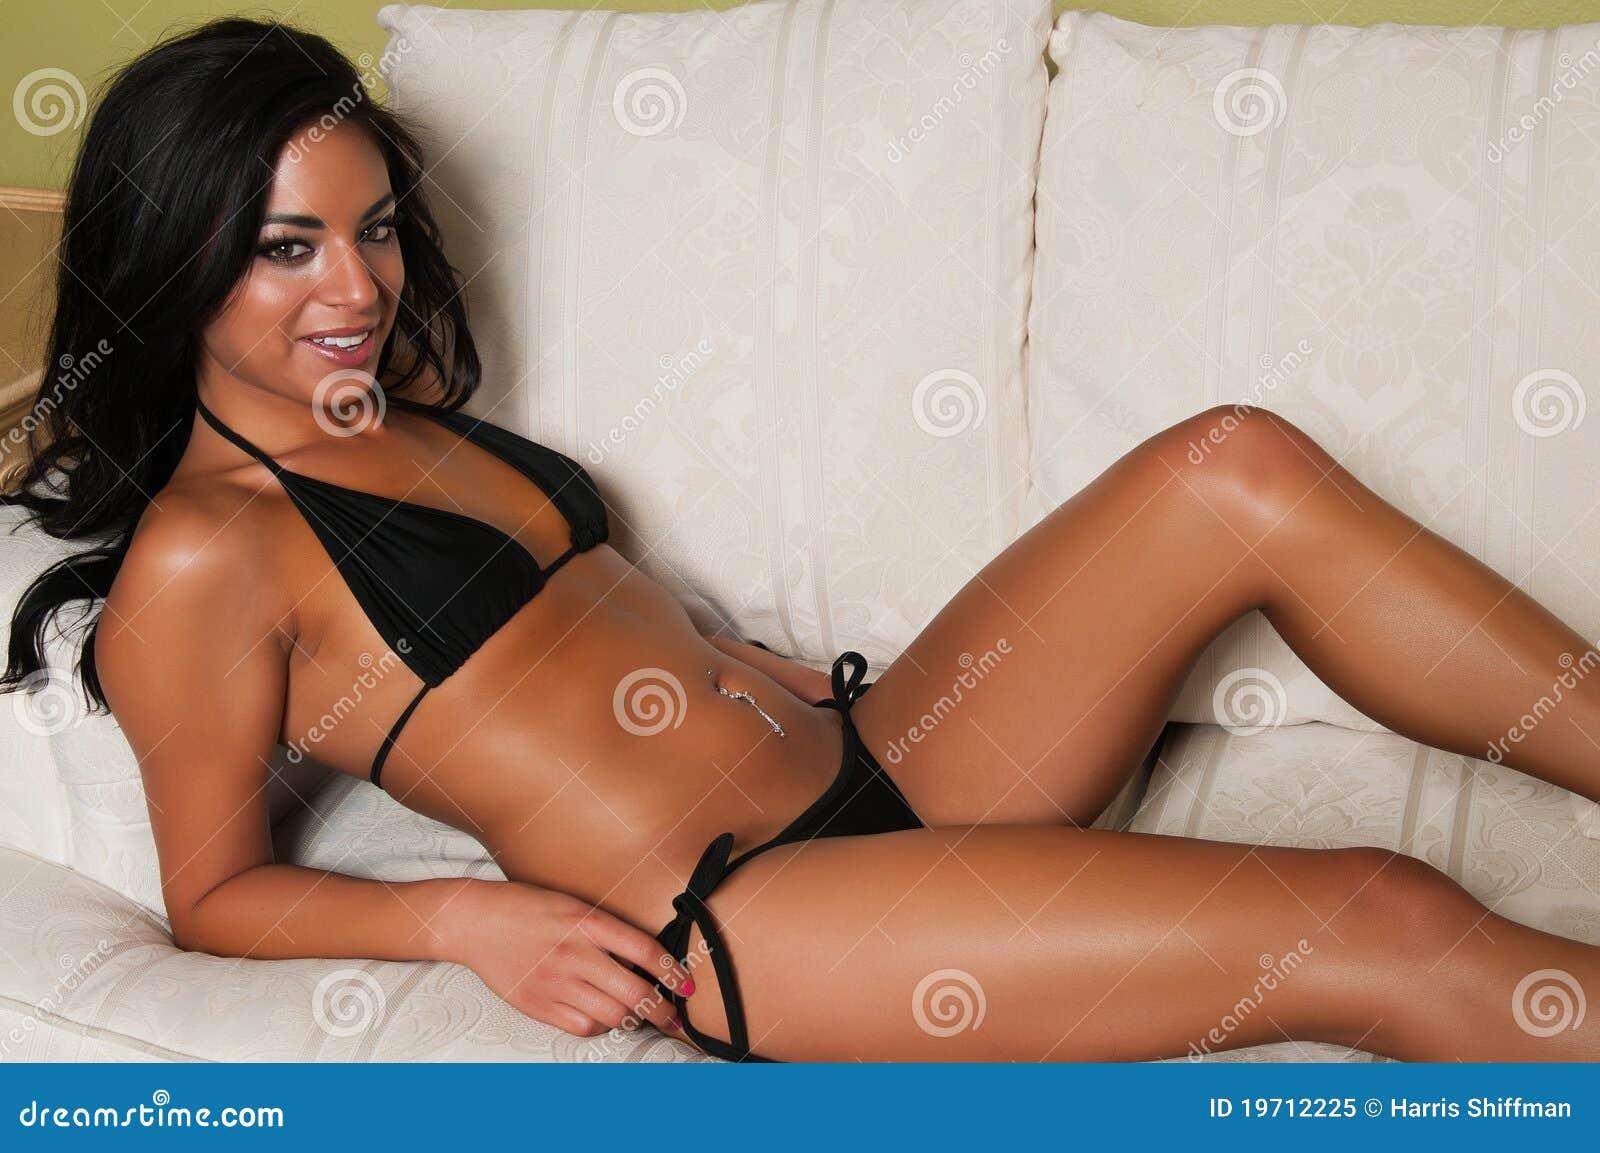 naked wife photos